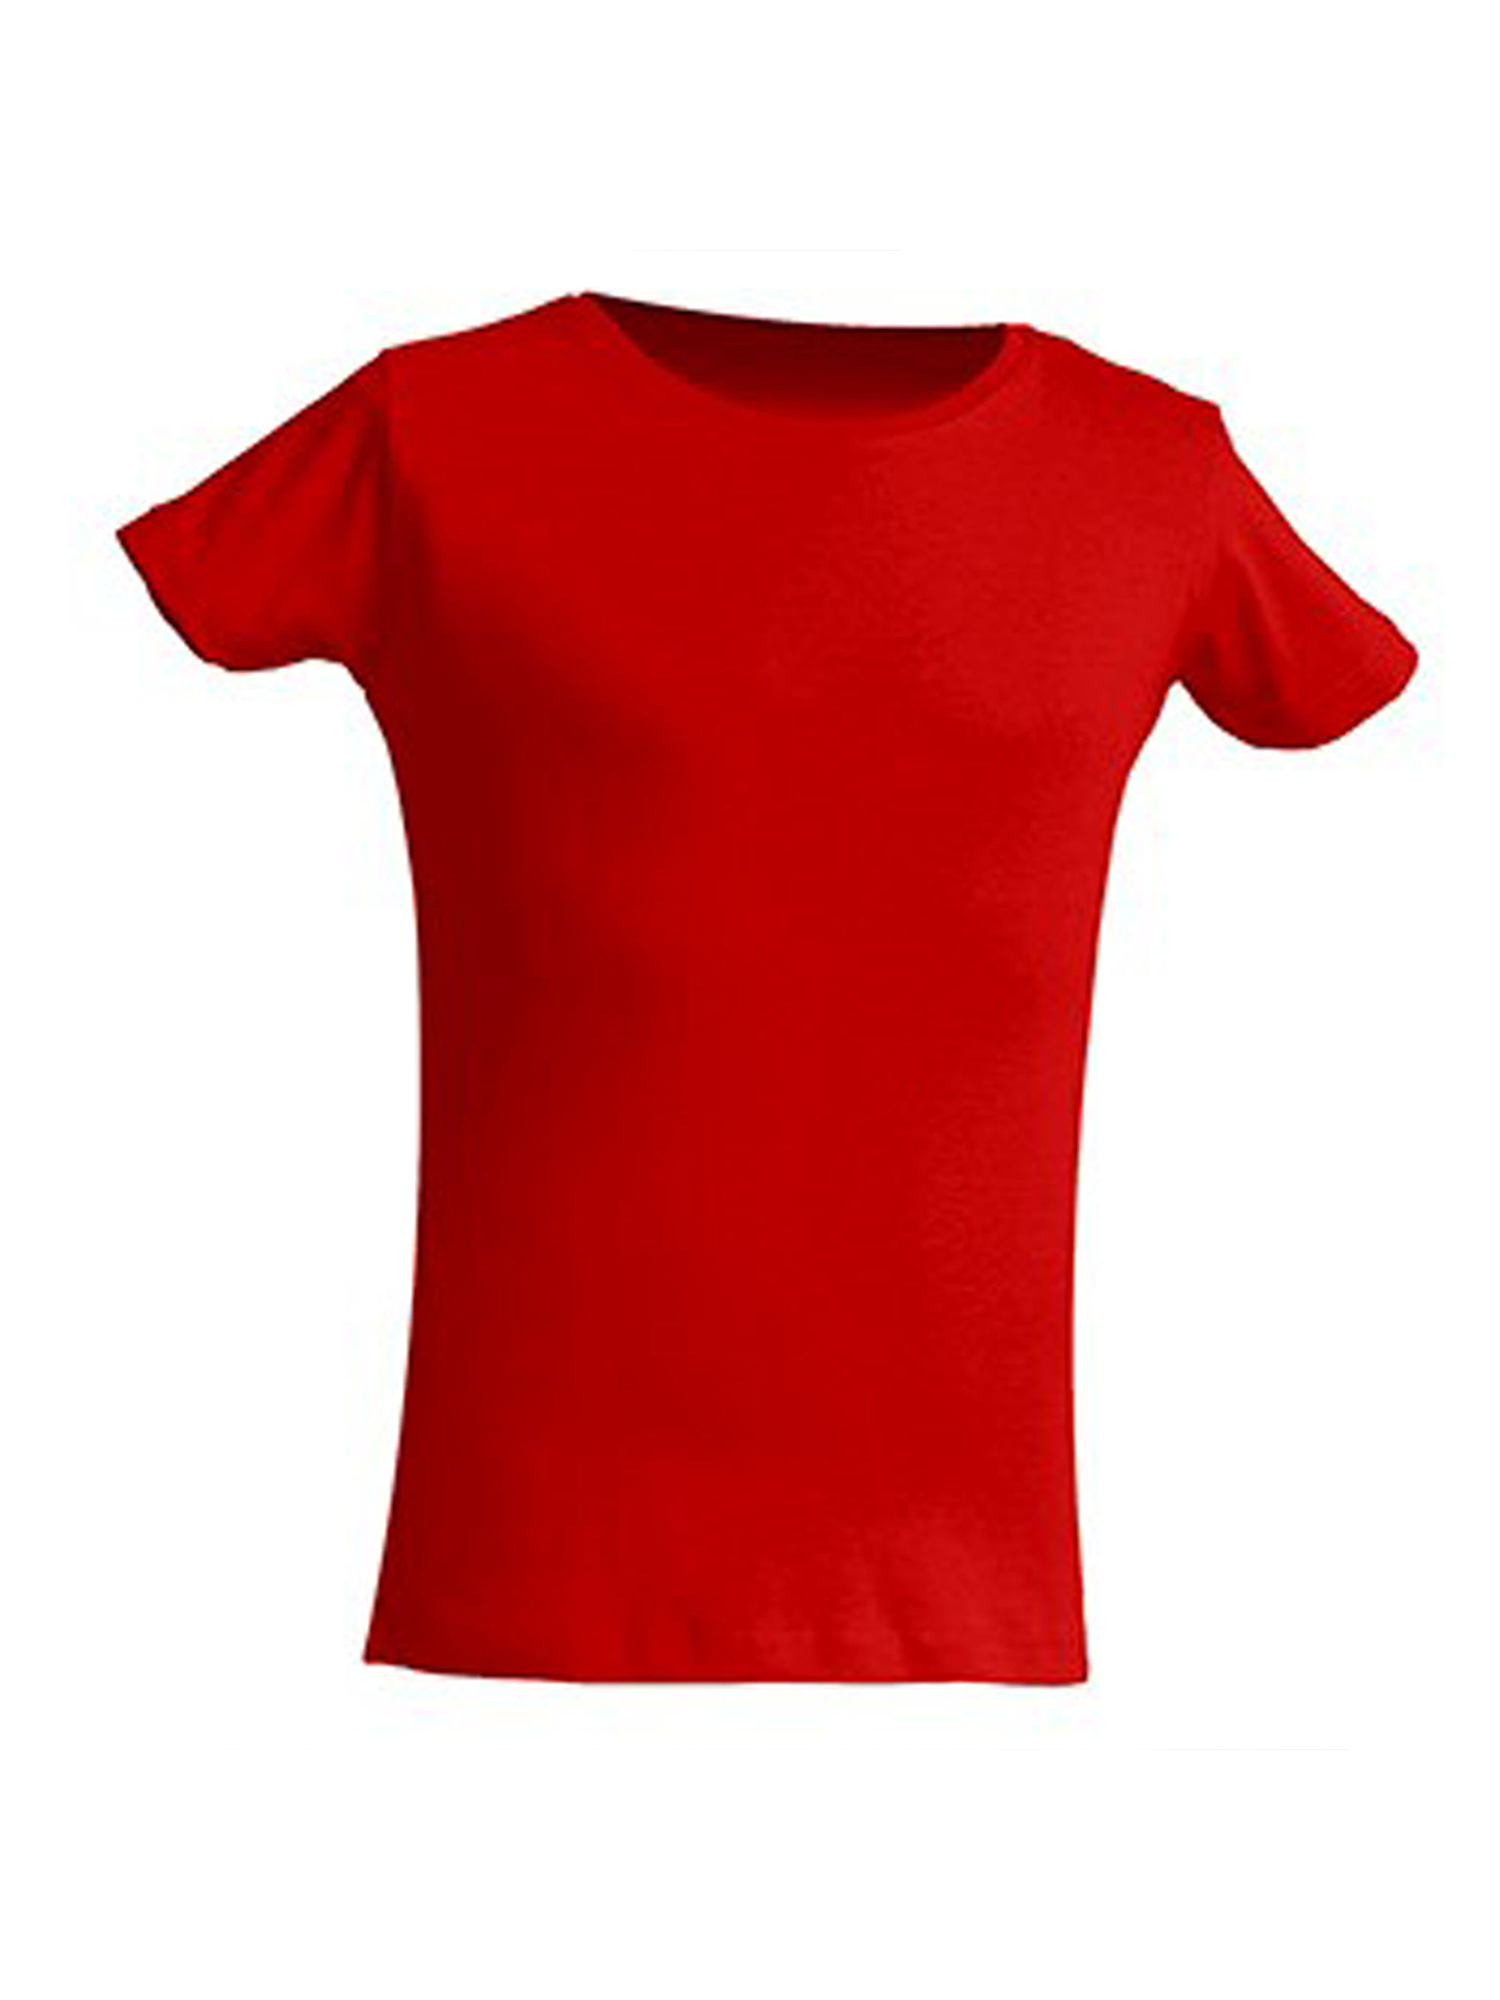 FRESH TEE Girl's Crew Neck Short Sleeve T-Shirt